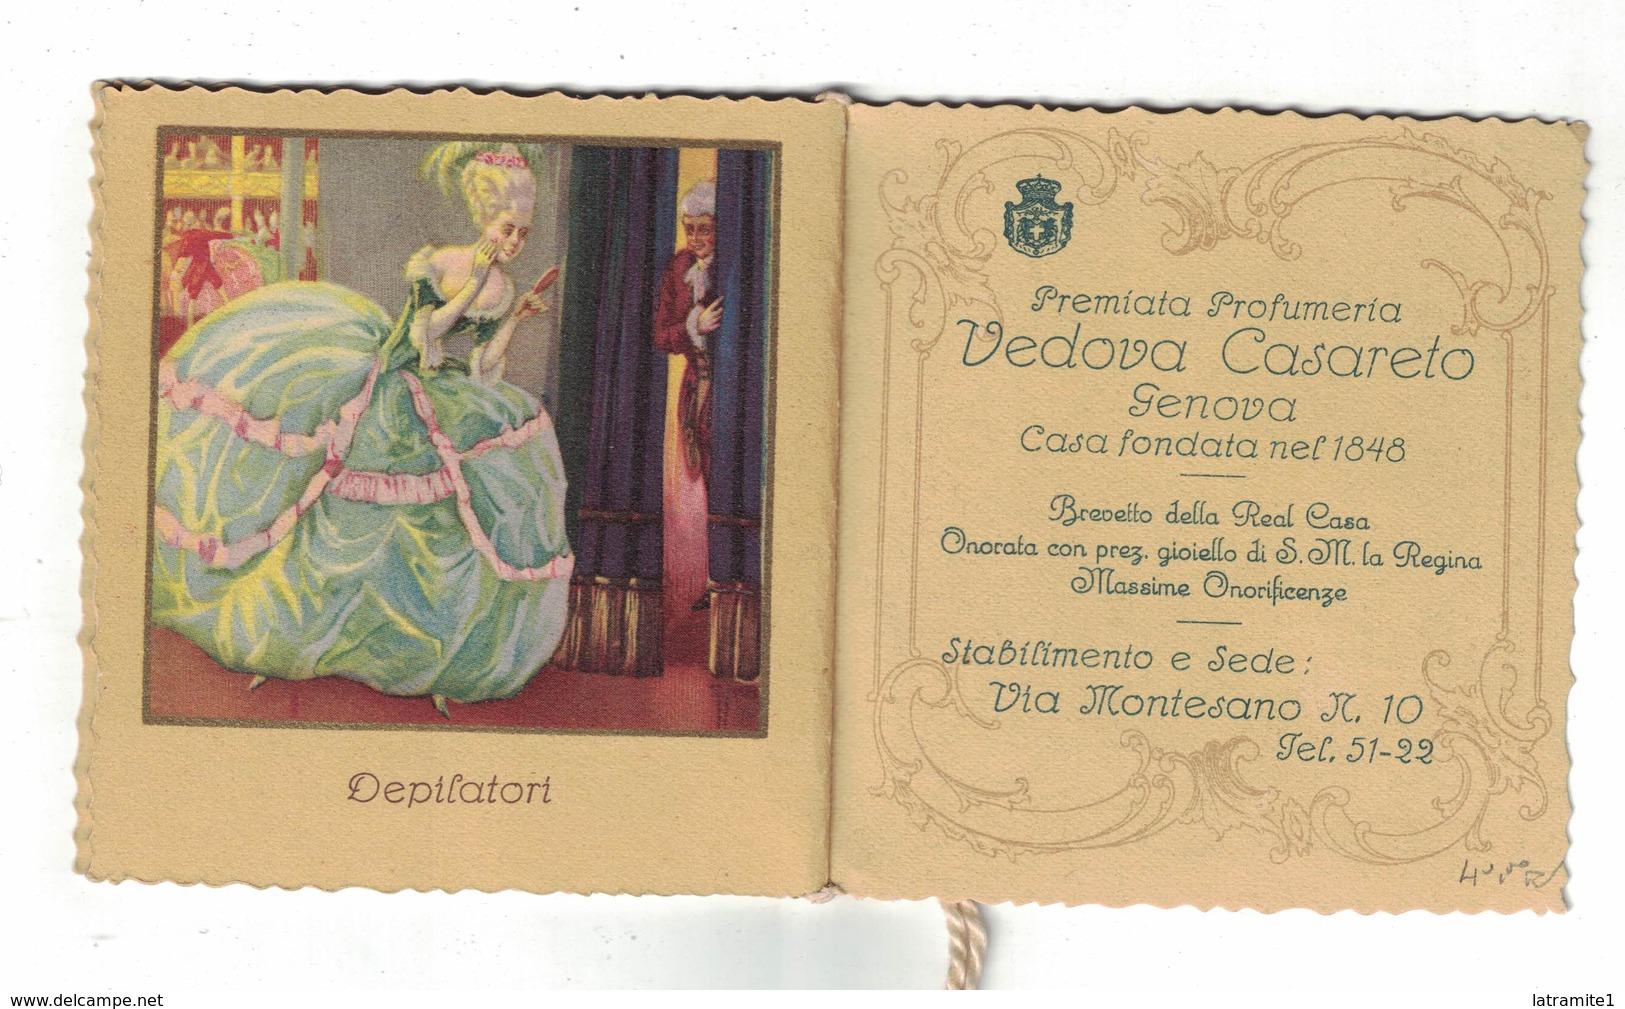 CALENDARIETTO  PREMIATA PROFUMERIA VEDOVA CASARETO GENOVA  1924 - Calendari